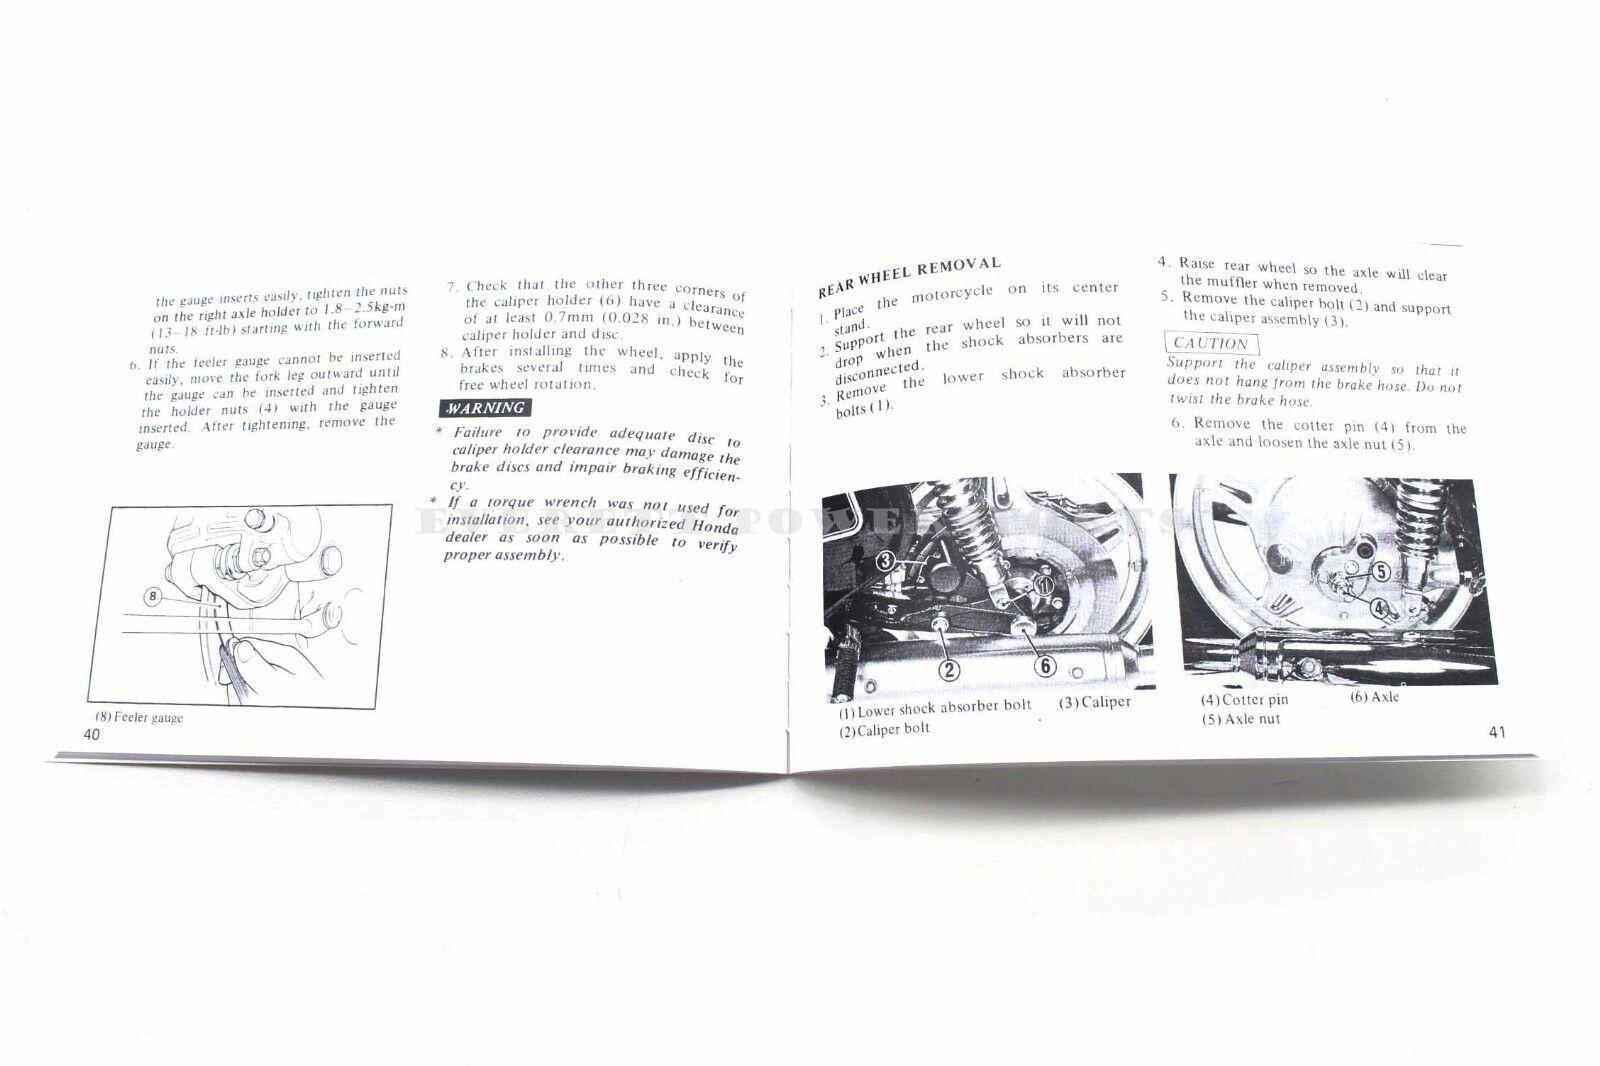 Manuals & Literature New Owners Manual 1978 GL1000 K2